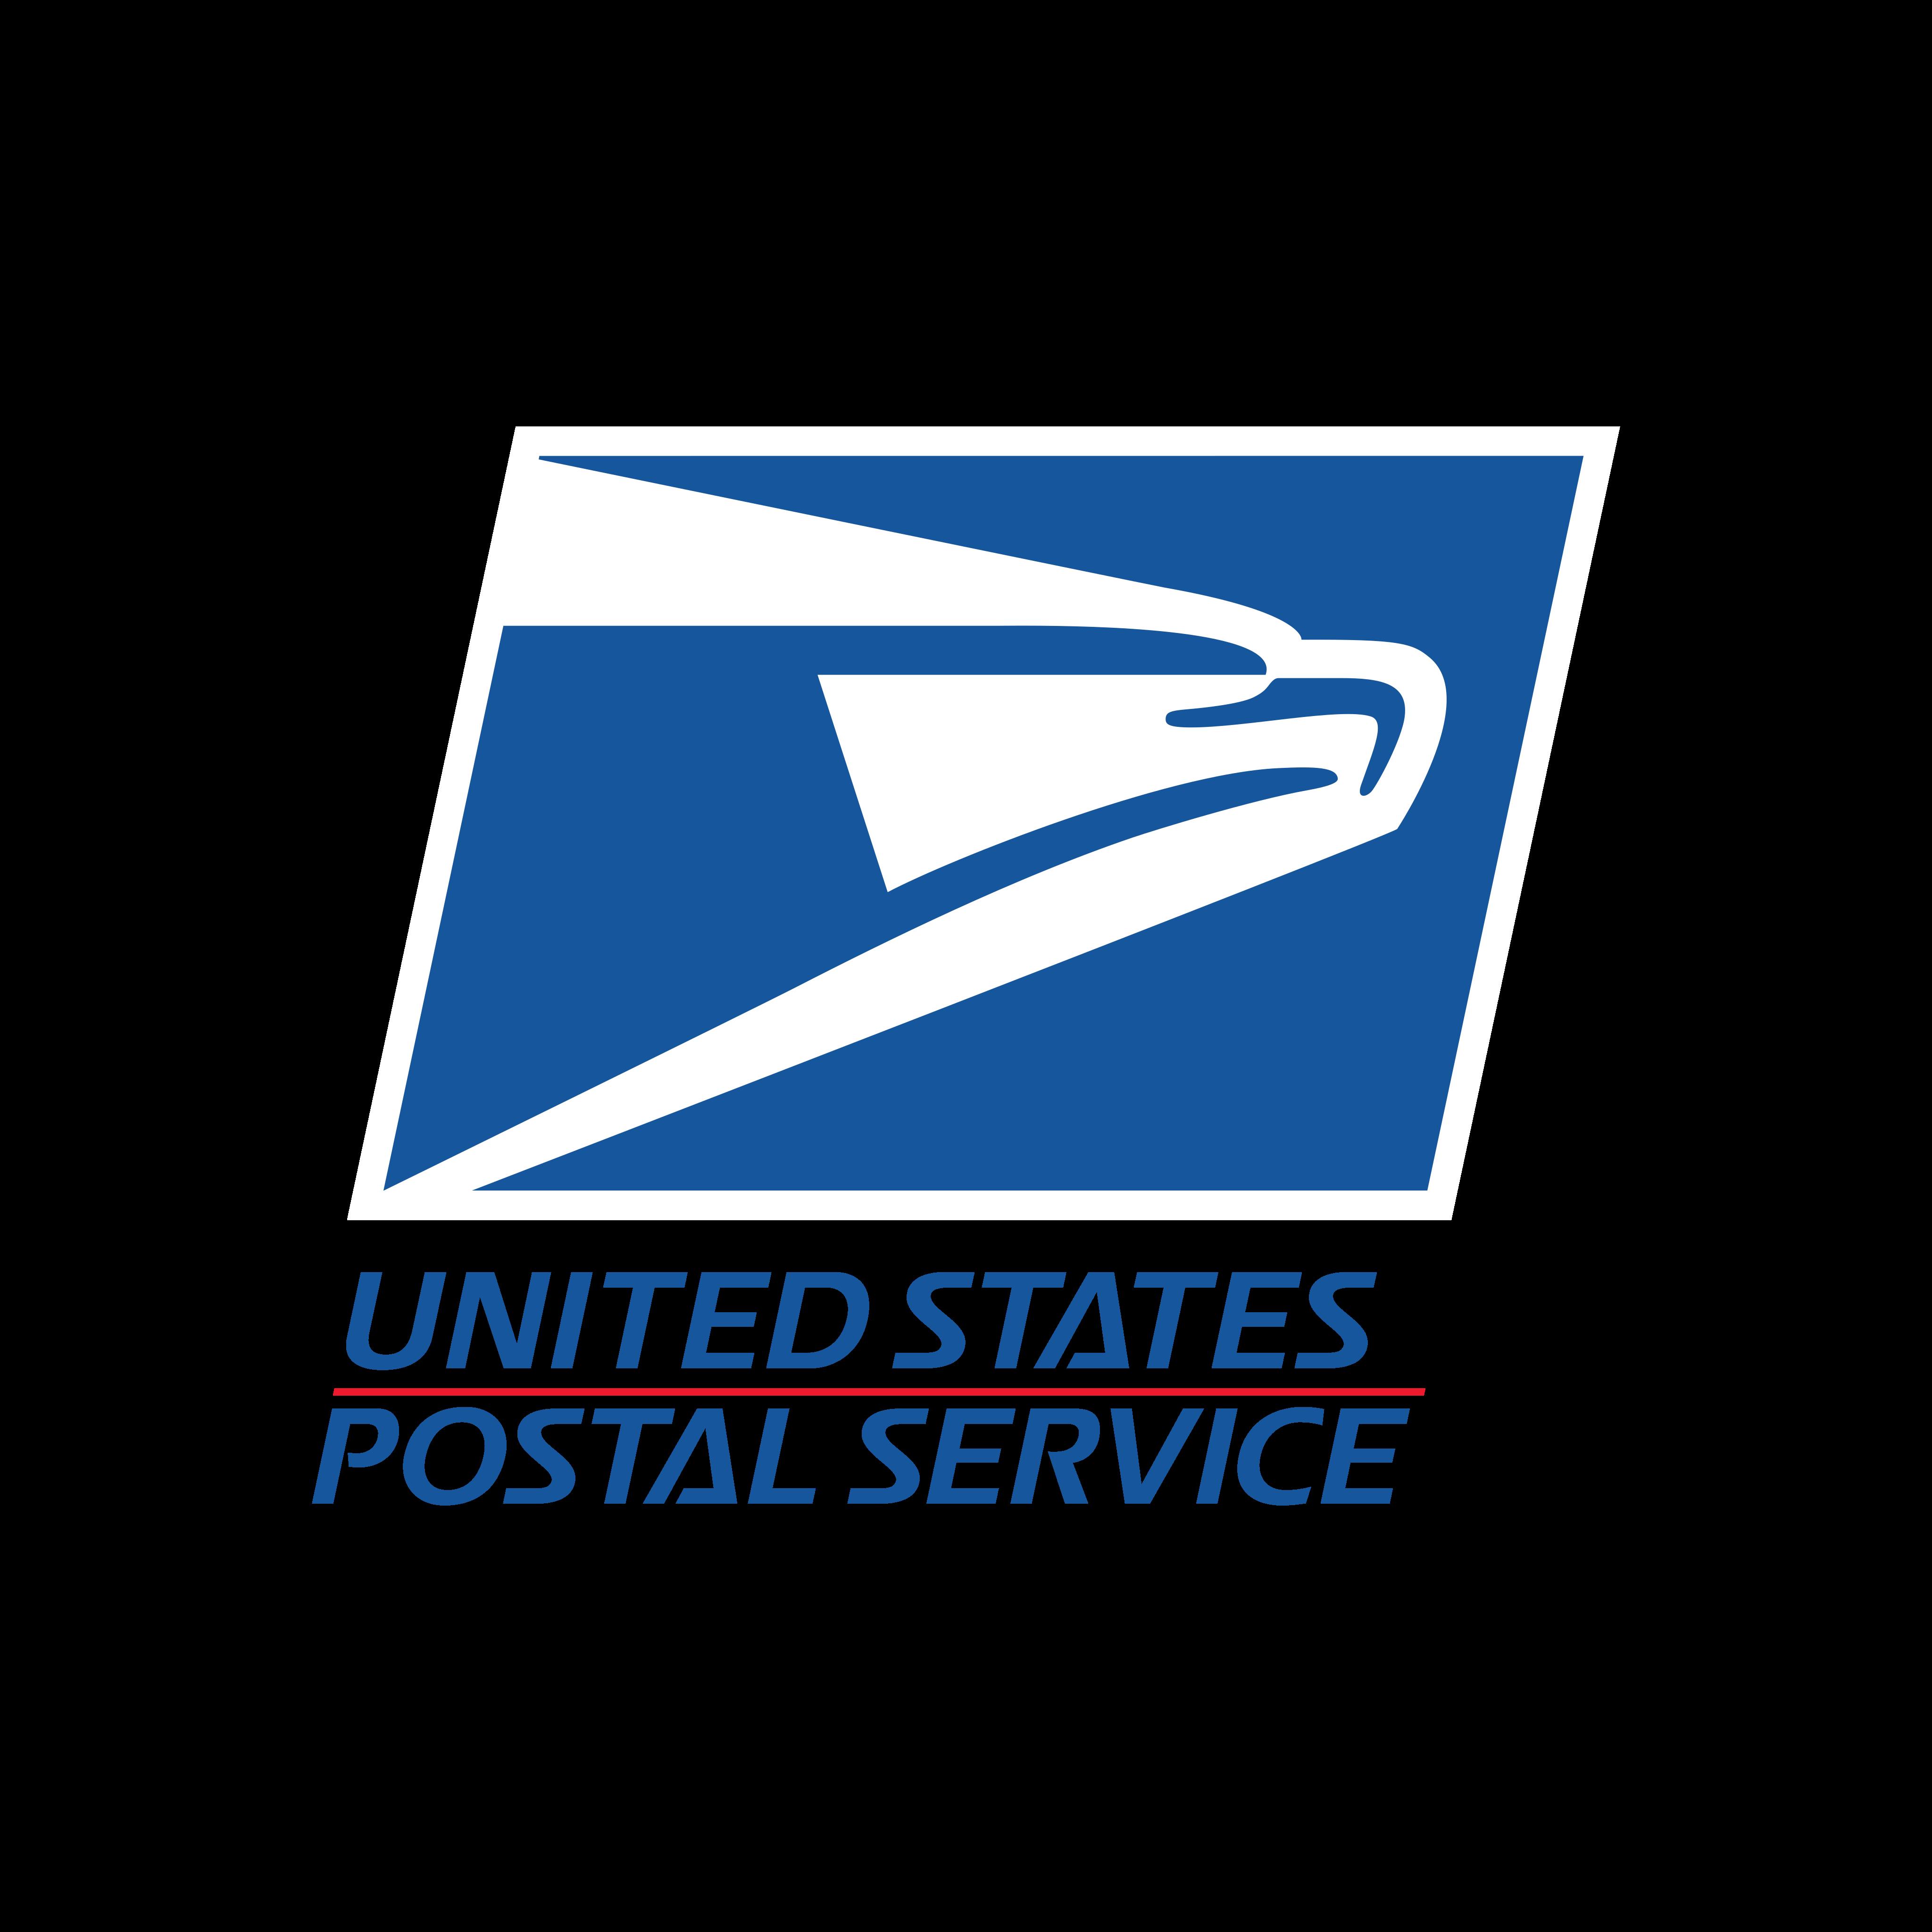 united states postal service usps logo 0 - USPS Logo - United States Postal Service Logo